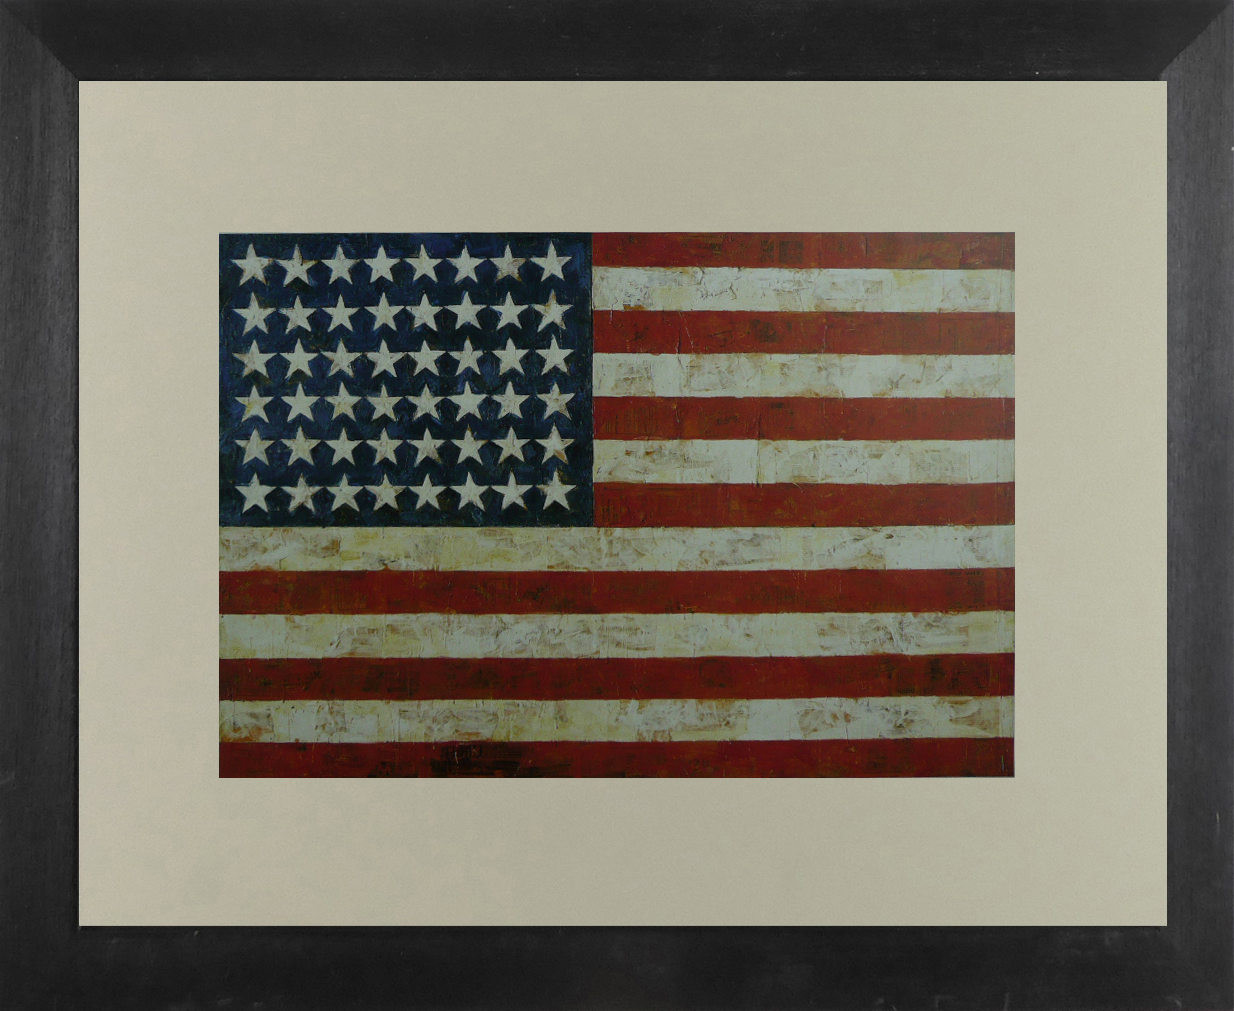 The American Flag  - Jasper Johns - Framed Picture 11 x 14